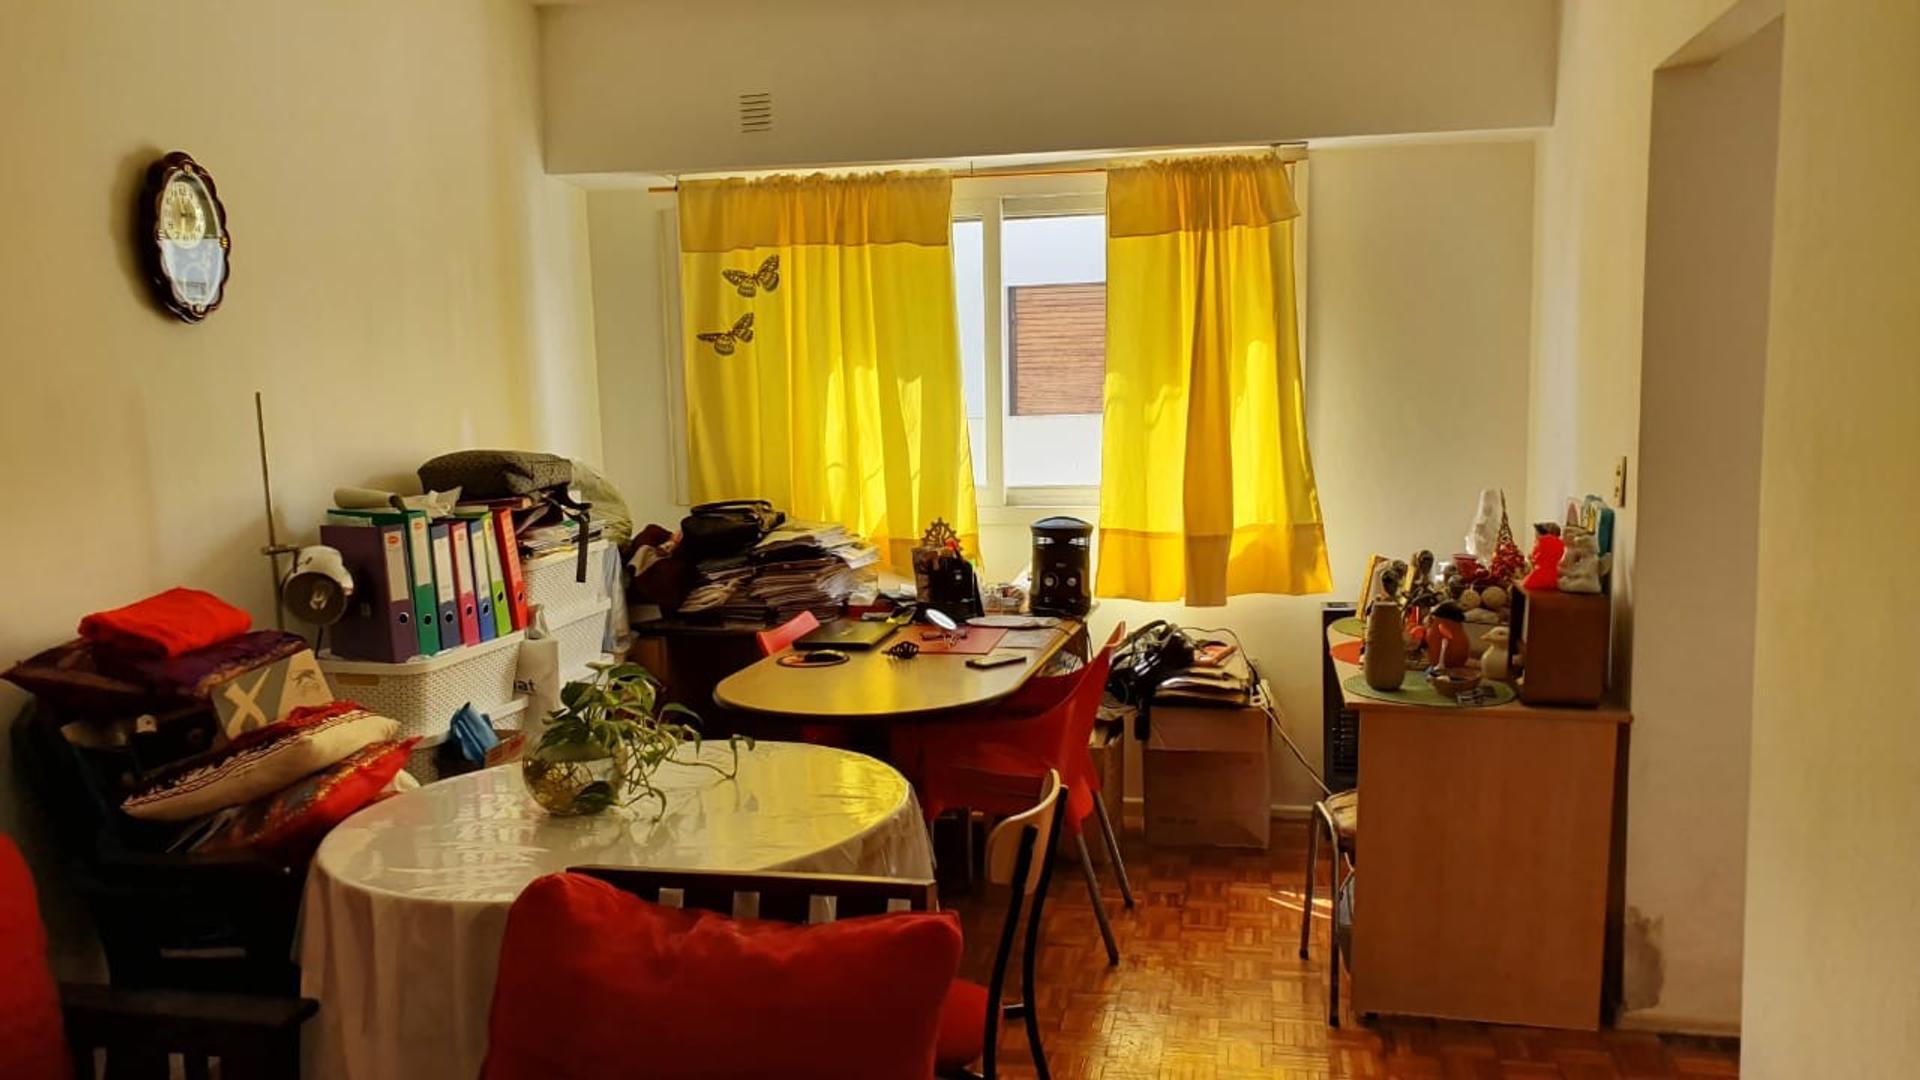 Av. Corrientes 2000 - 2 ambientes